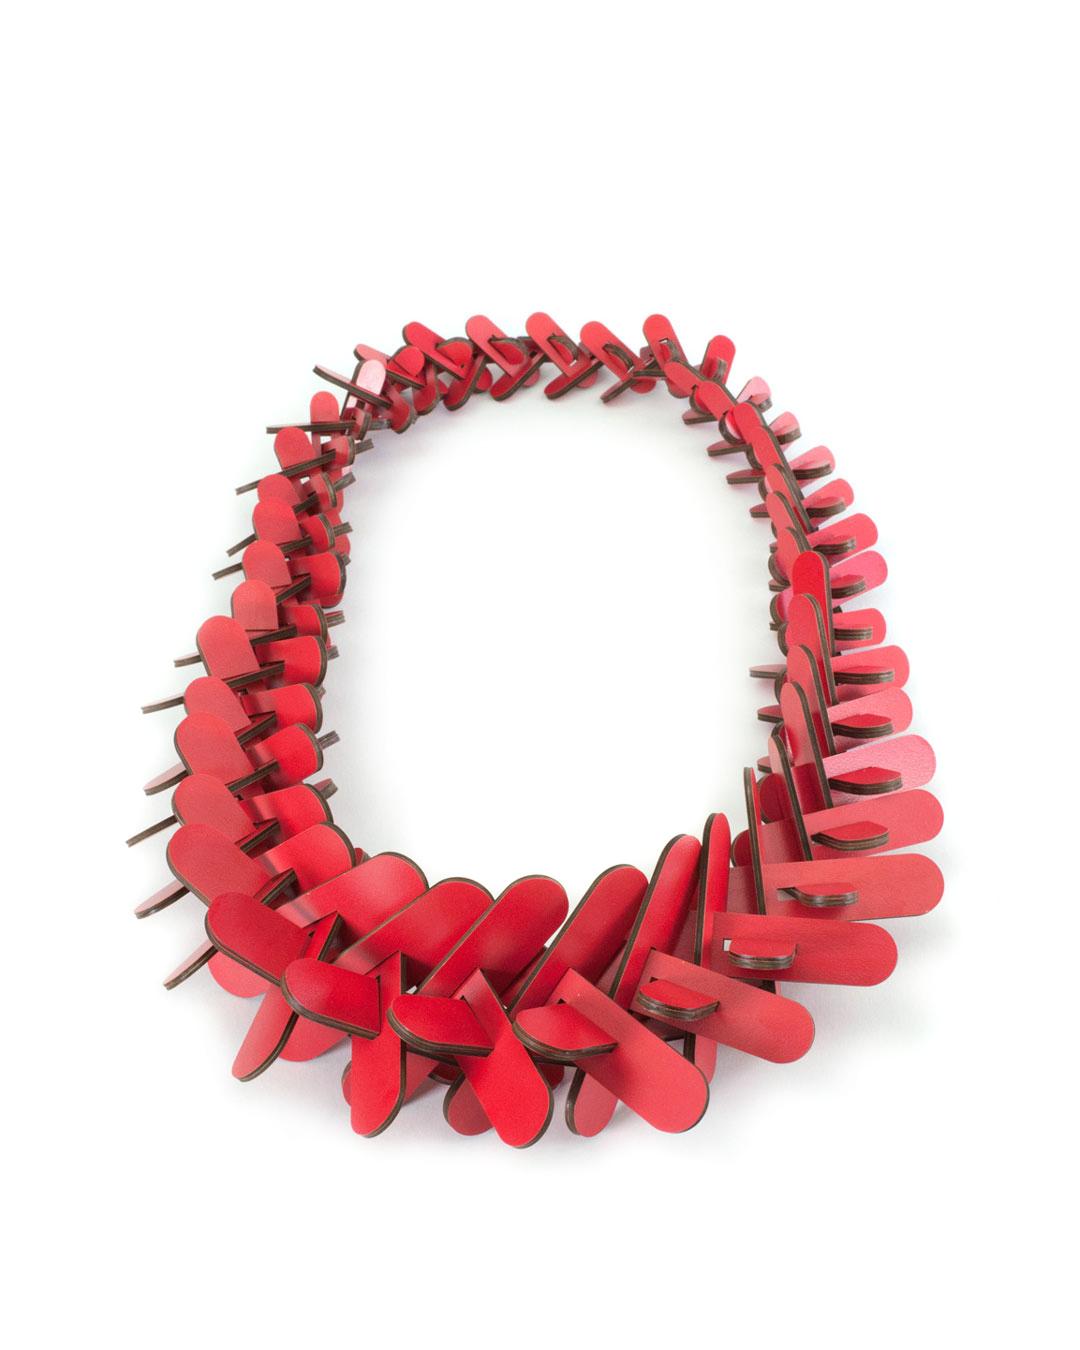 Rebecca Hannon, Tapered Crown-of-Thorns, 2016, neckpiece; laminate, 360 x 180 x 65 mm, €2910